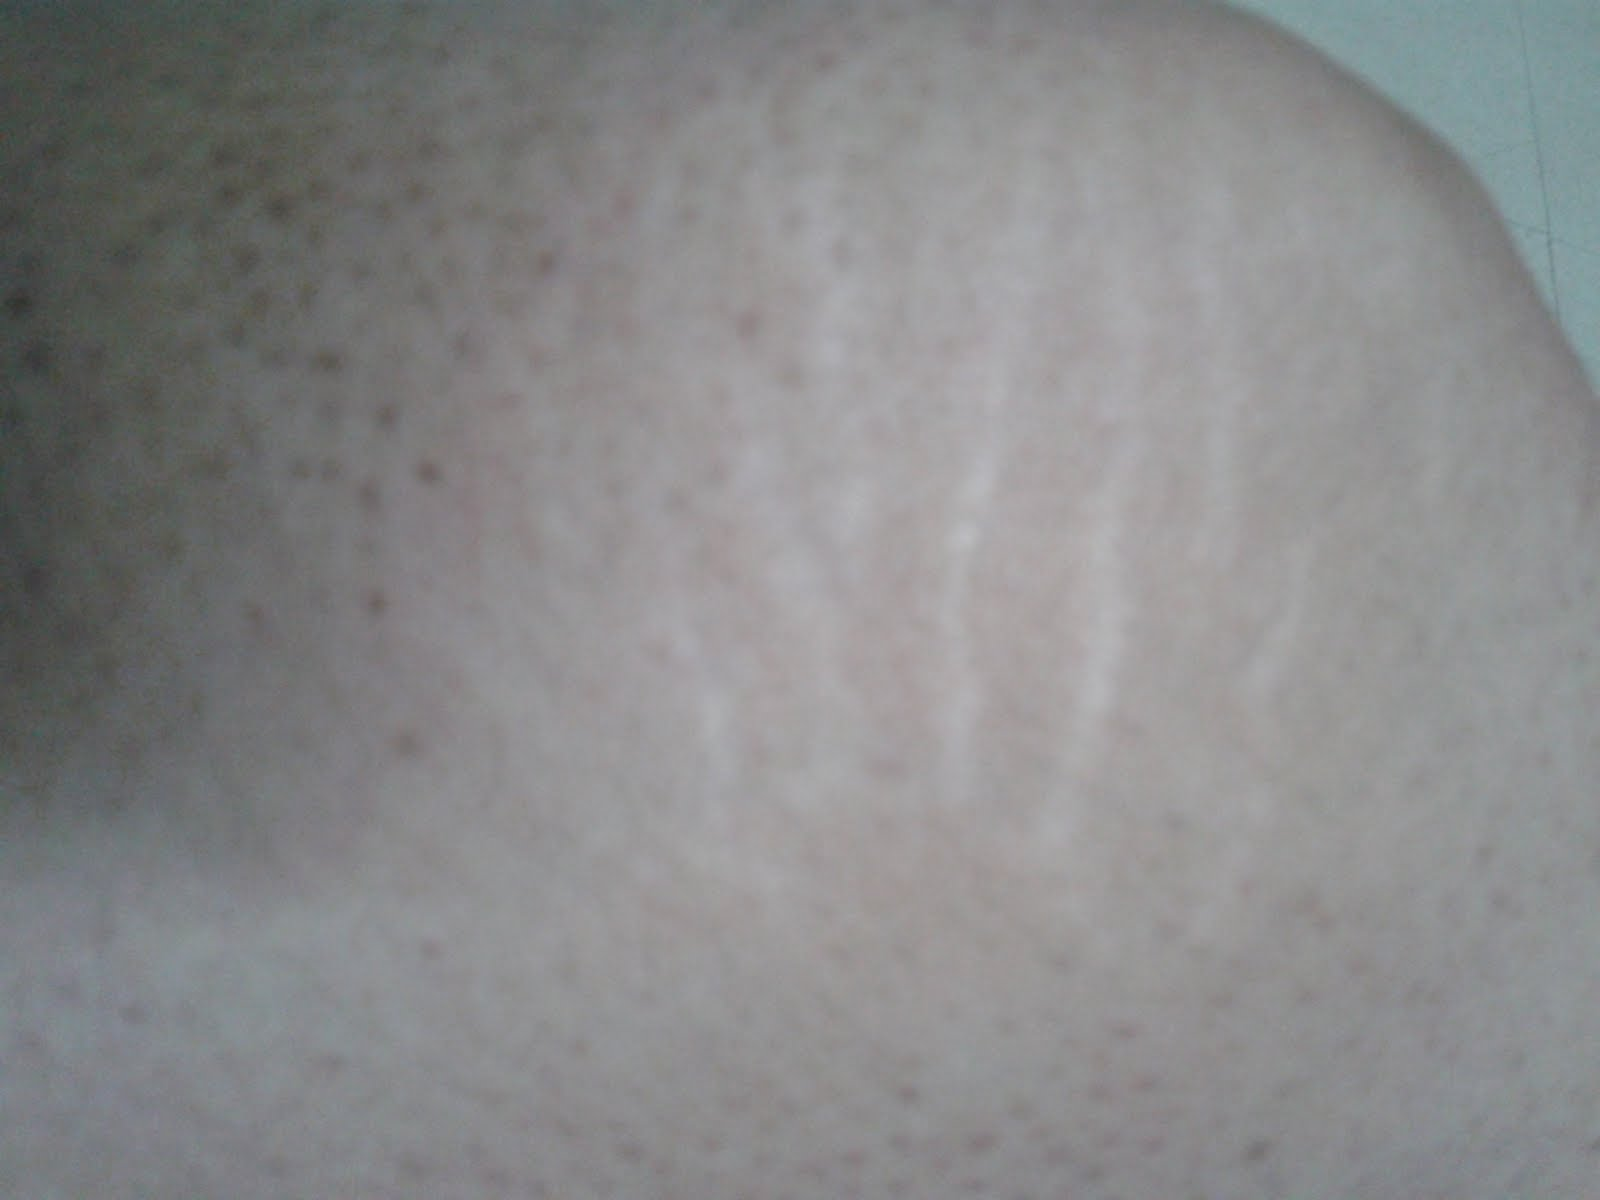 laser pour le visage cicatrice. Black Bedroom Furniture Sets. Home Design Ideas